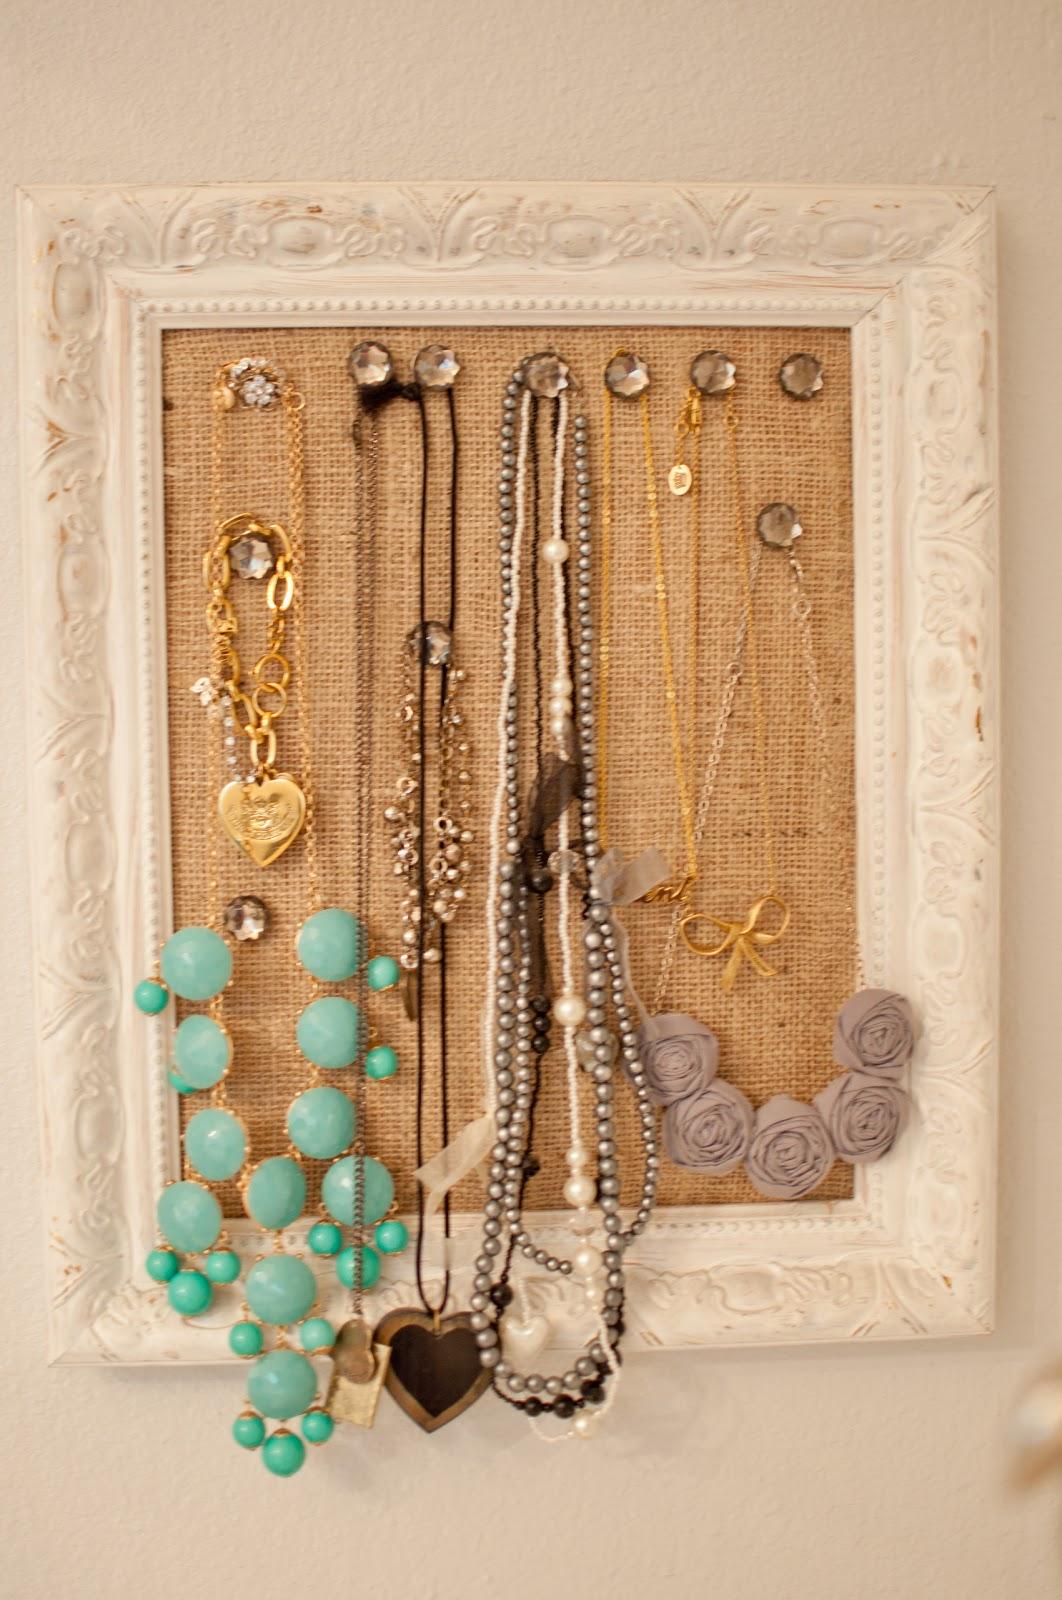 Domestic Fashionista DIY Cork Board Jewelry Frame